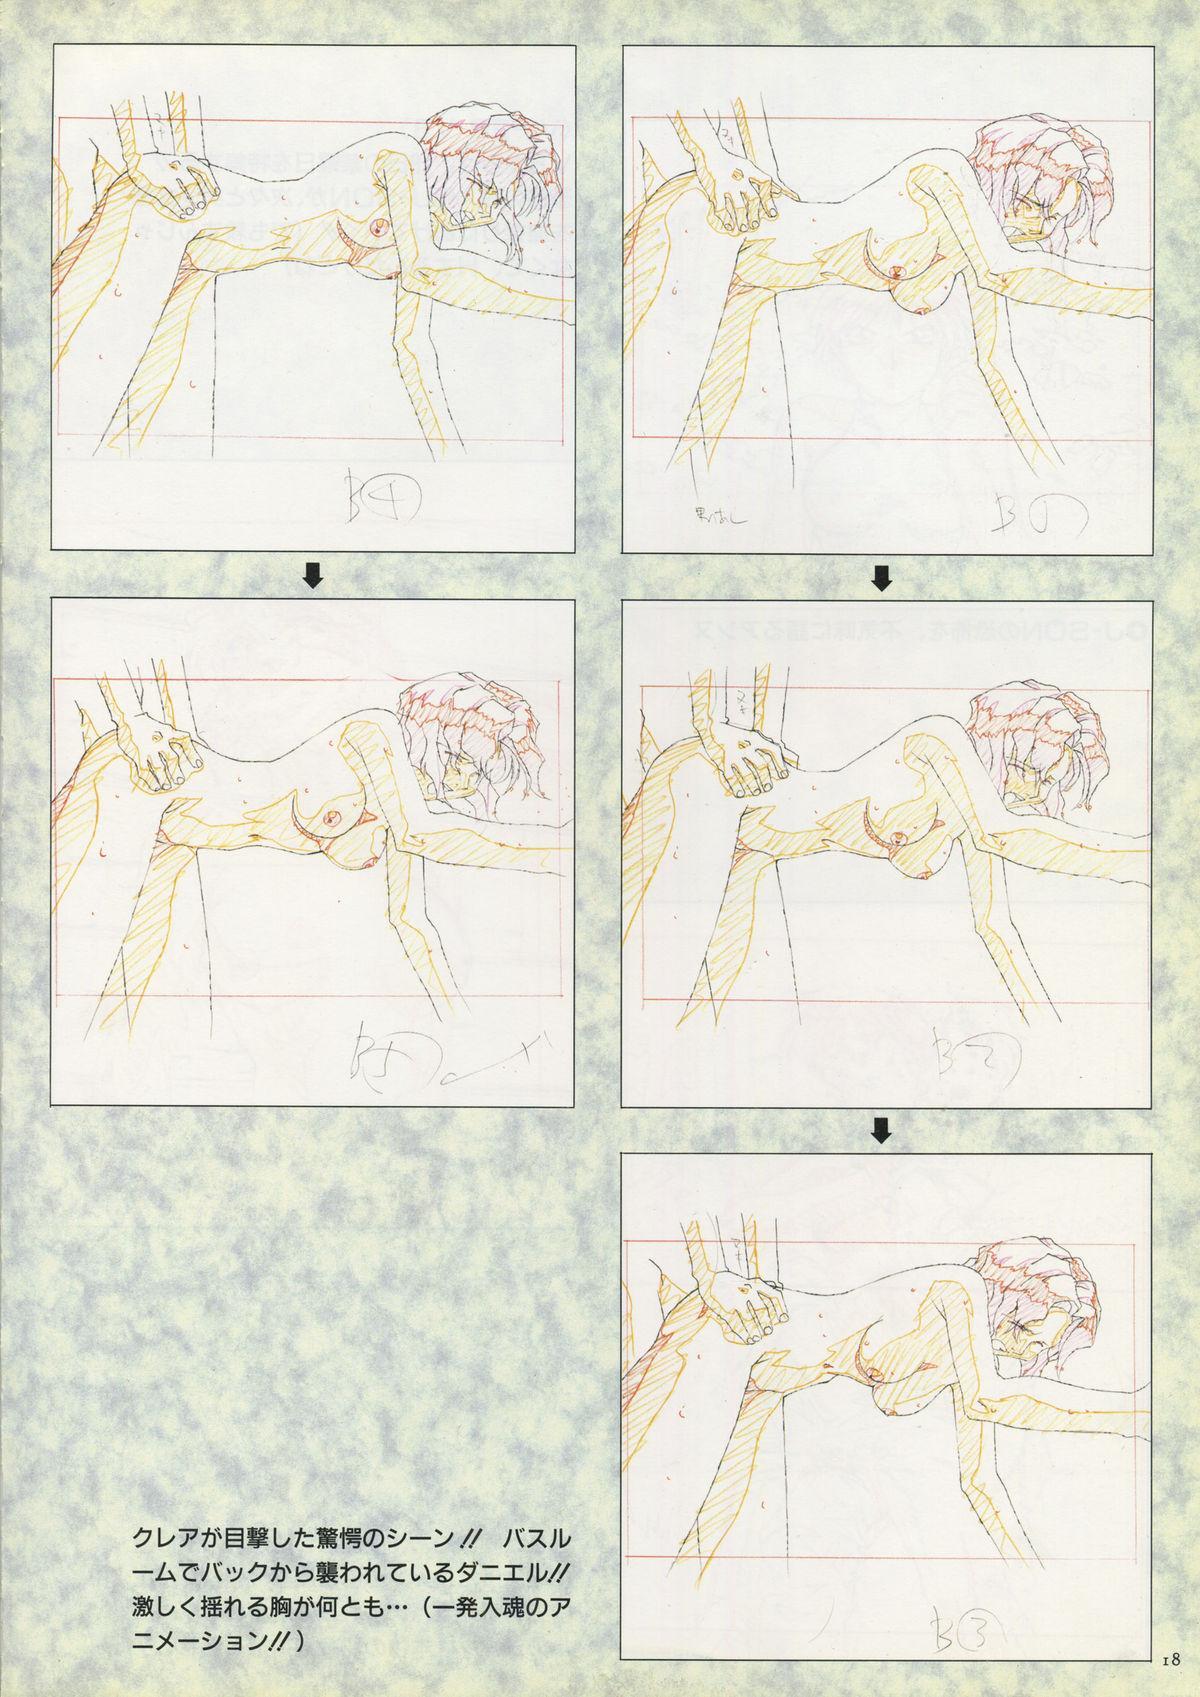 VIPER Series Official Artbook 15